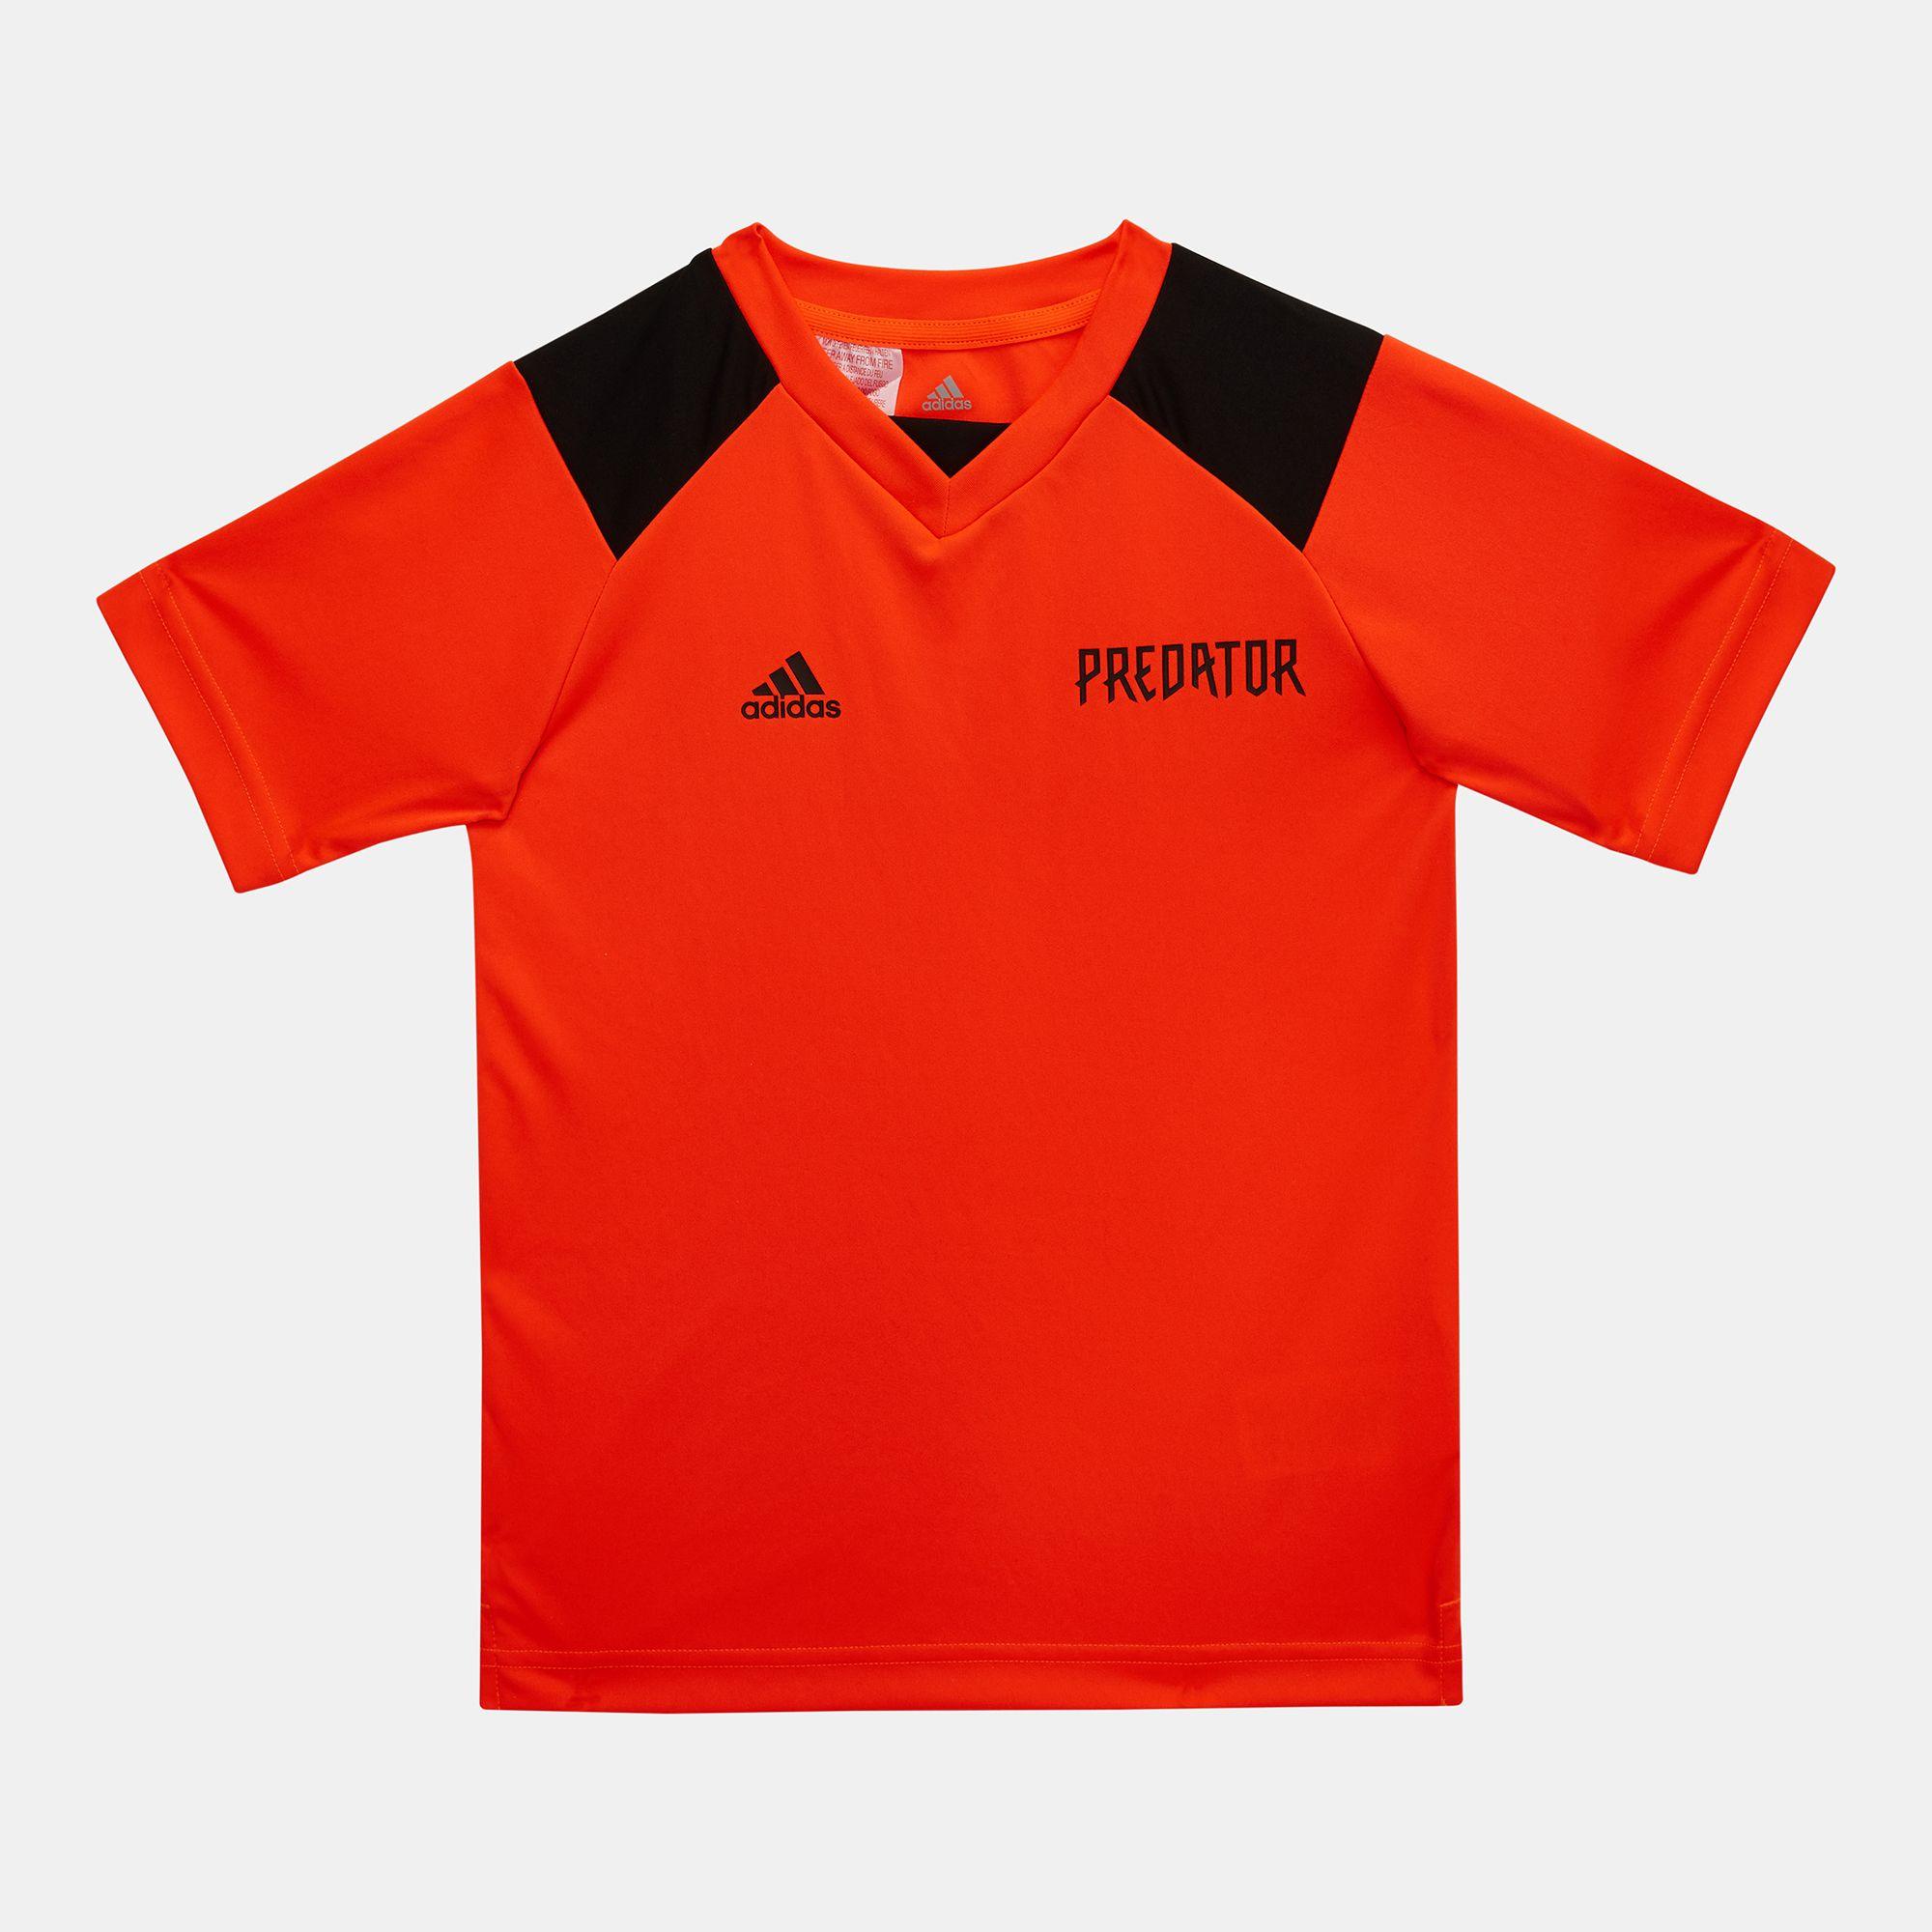 88956fbd4cf7 Shop Orange adidas Kids' Predator Football Jersey for Kids by adidas | SSS